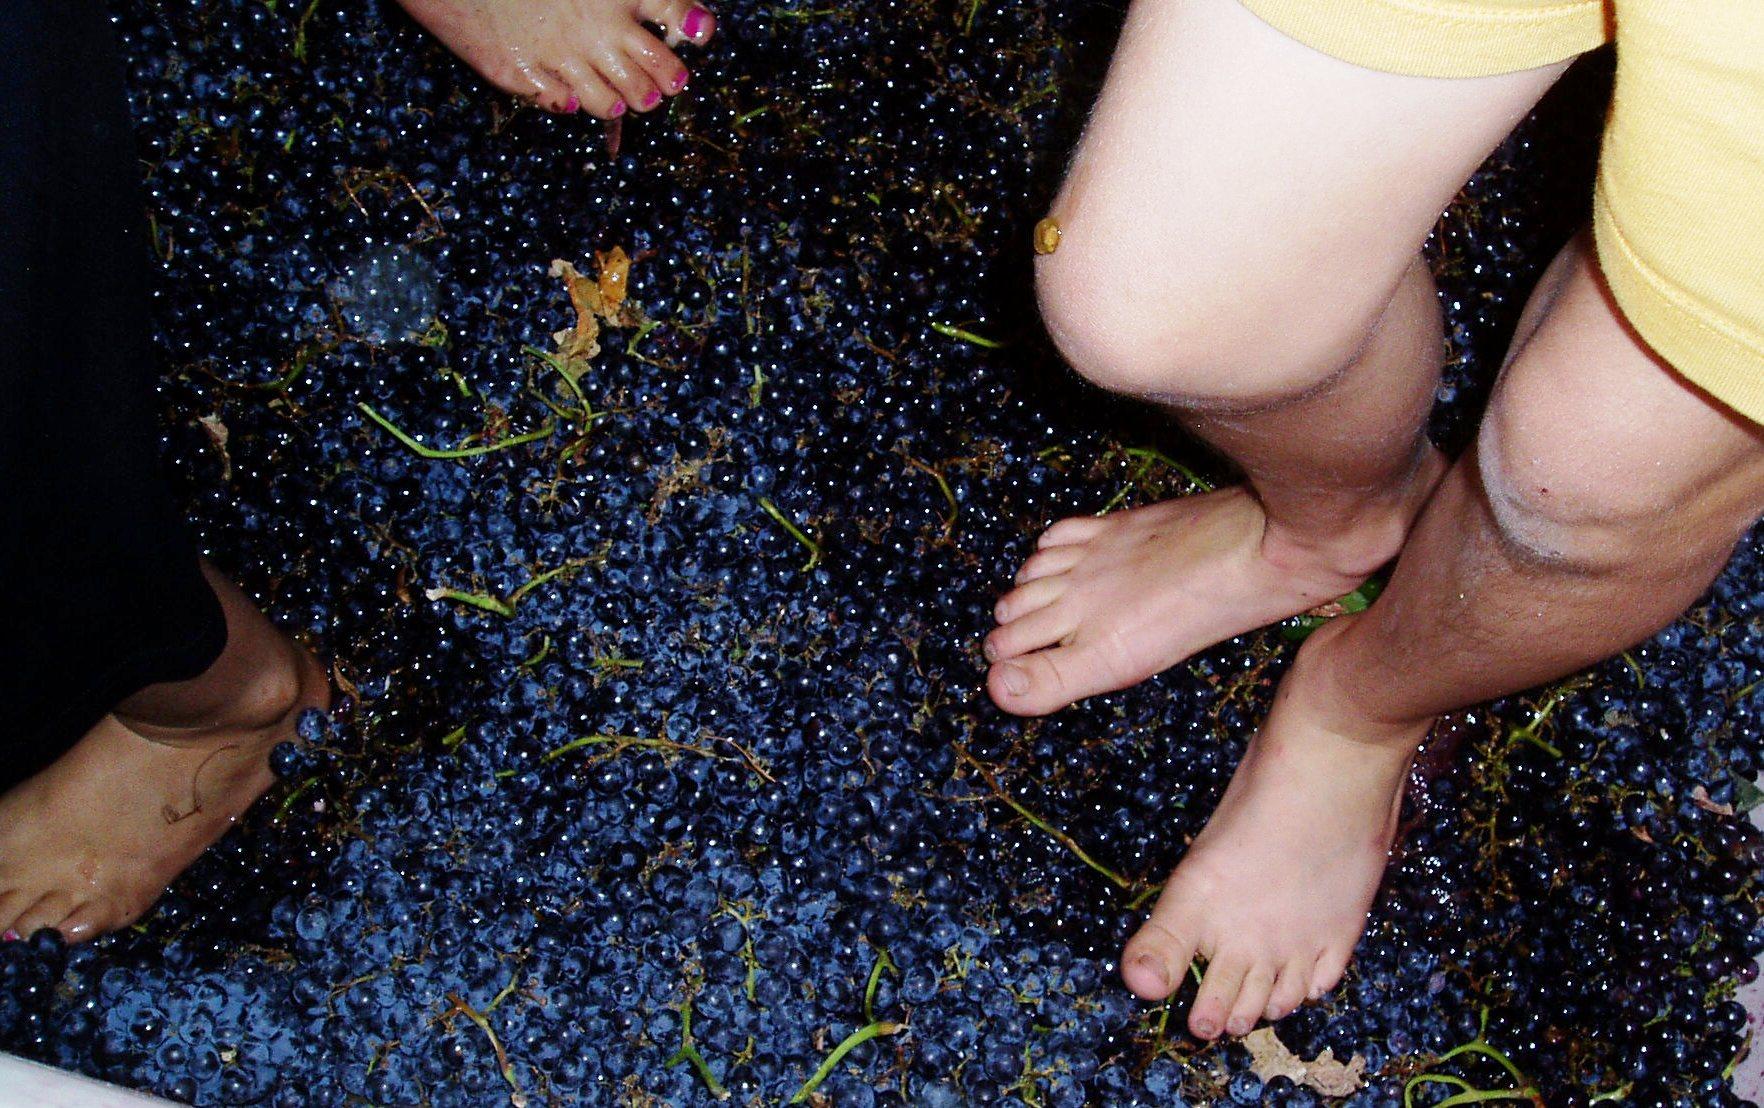 grape-stomping.jpg